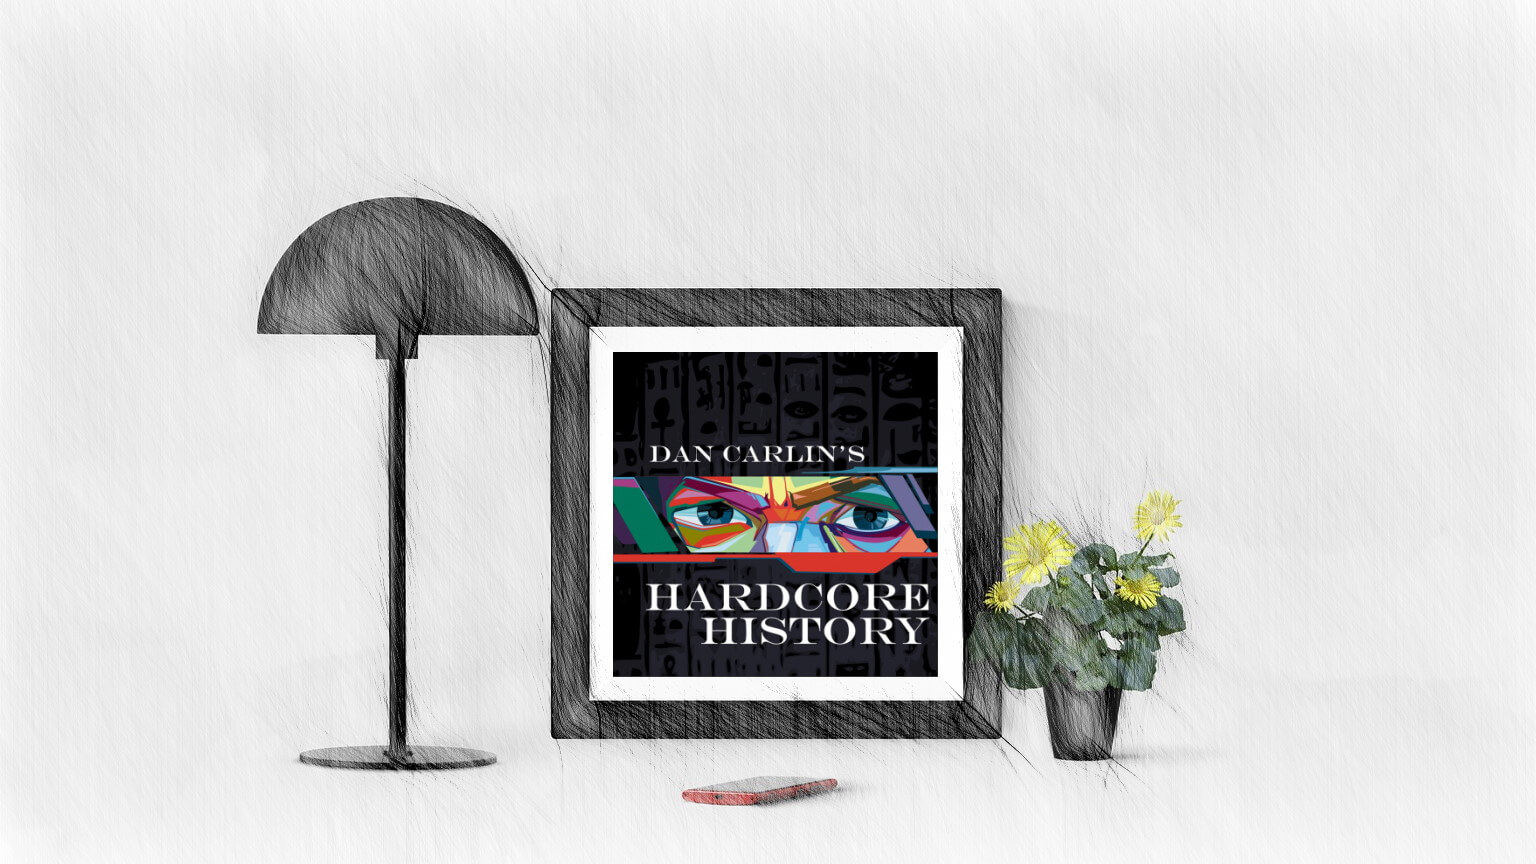 Dan Carlin's Hardcore History Cover